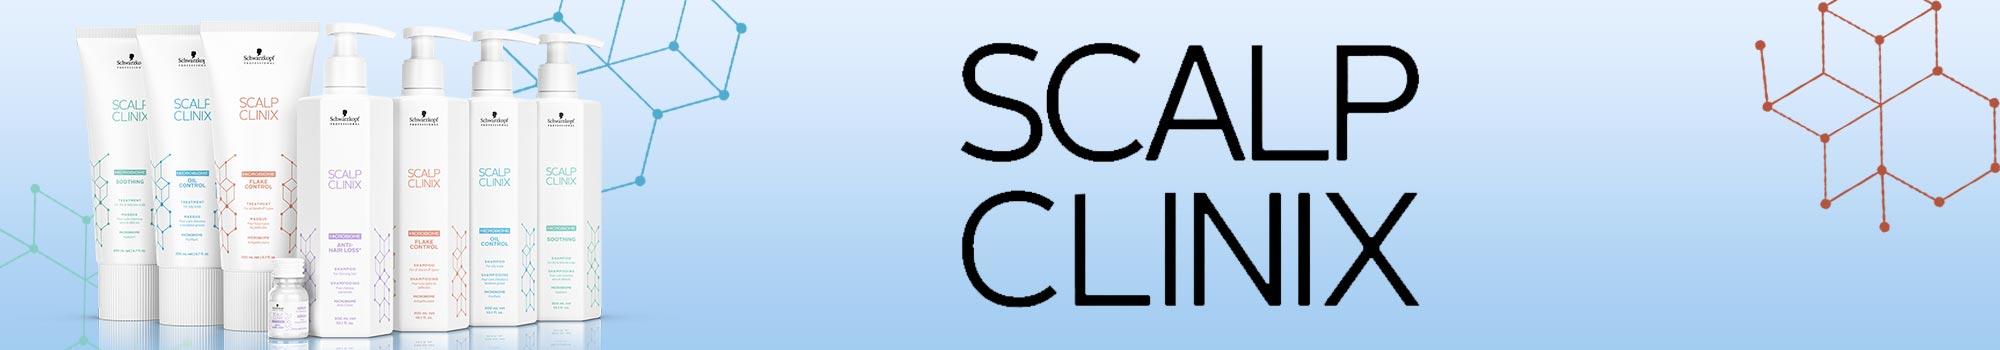 Scalp Clinix